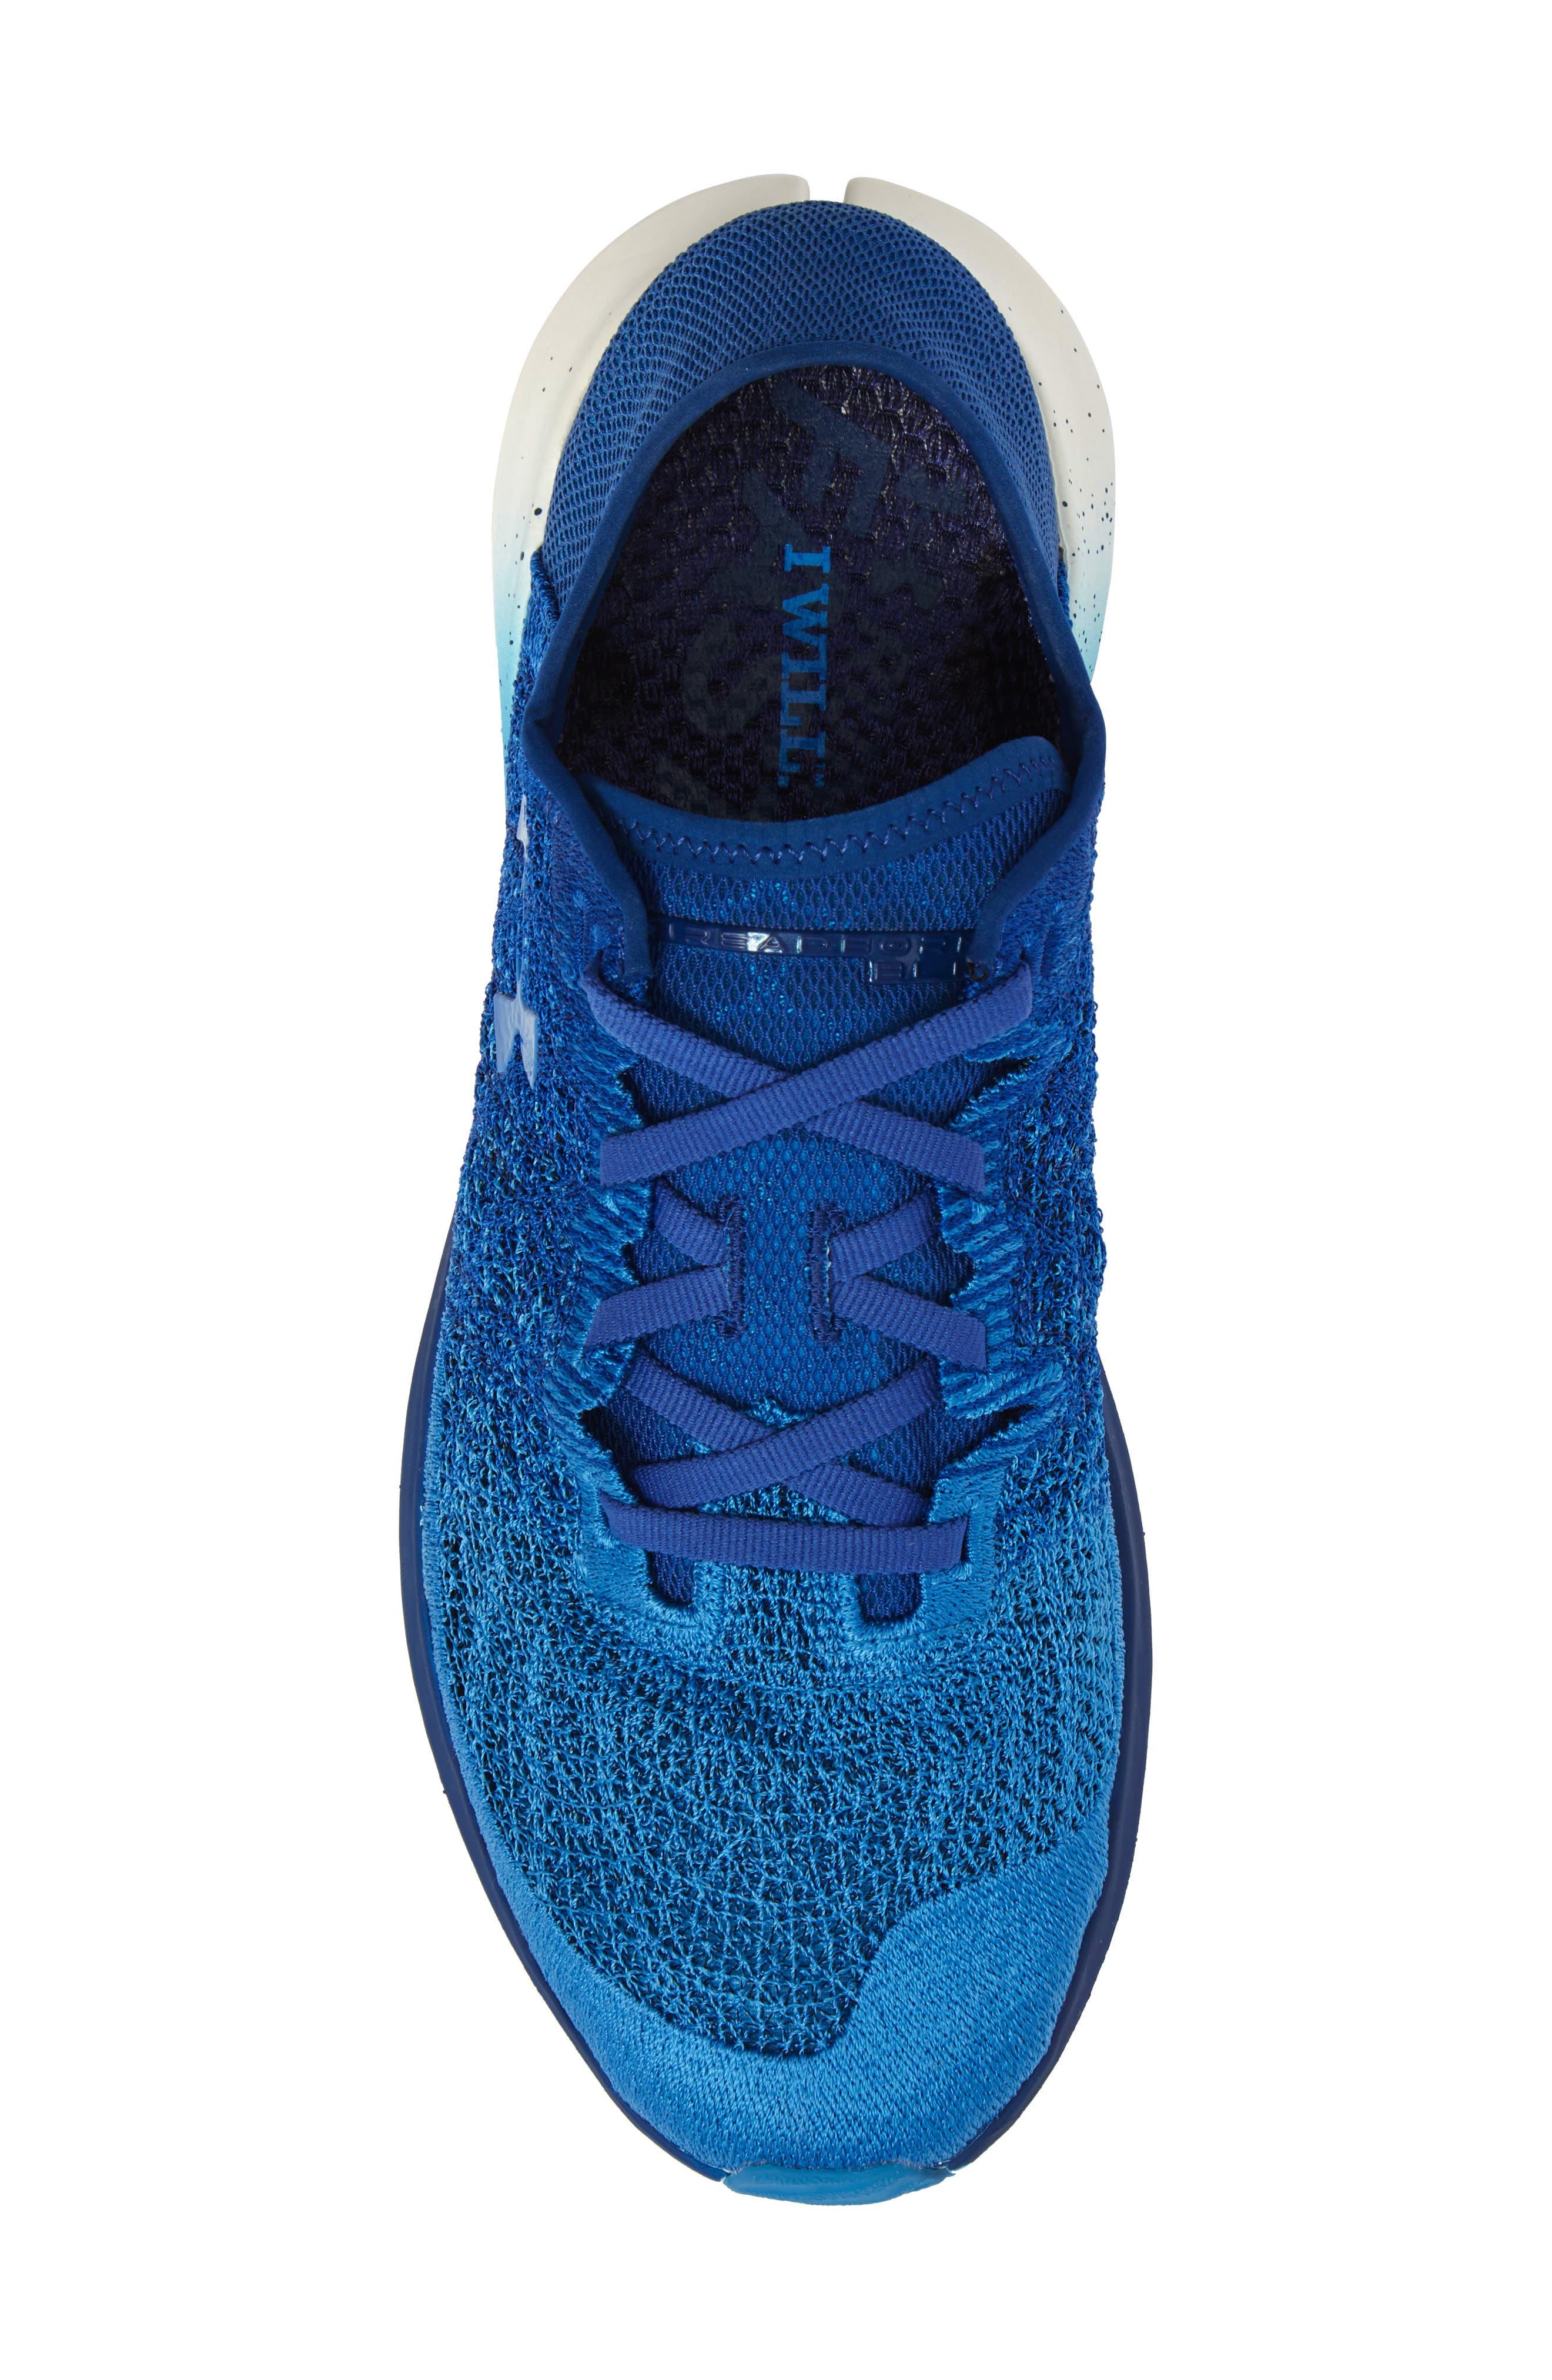 UNDER ARMOUR,                             Threadborne Blur Running Shoe,                             Alternate thumbnail 5, color,                             400